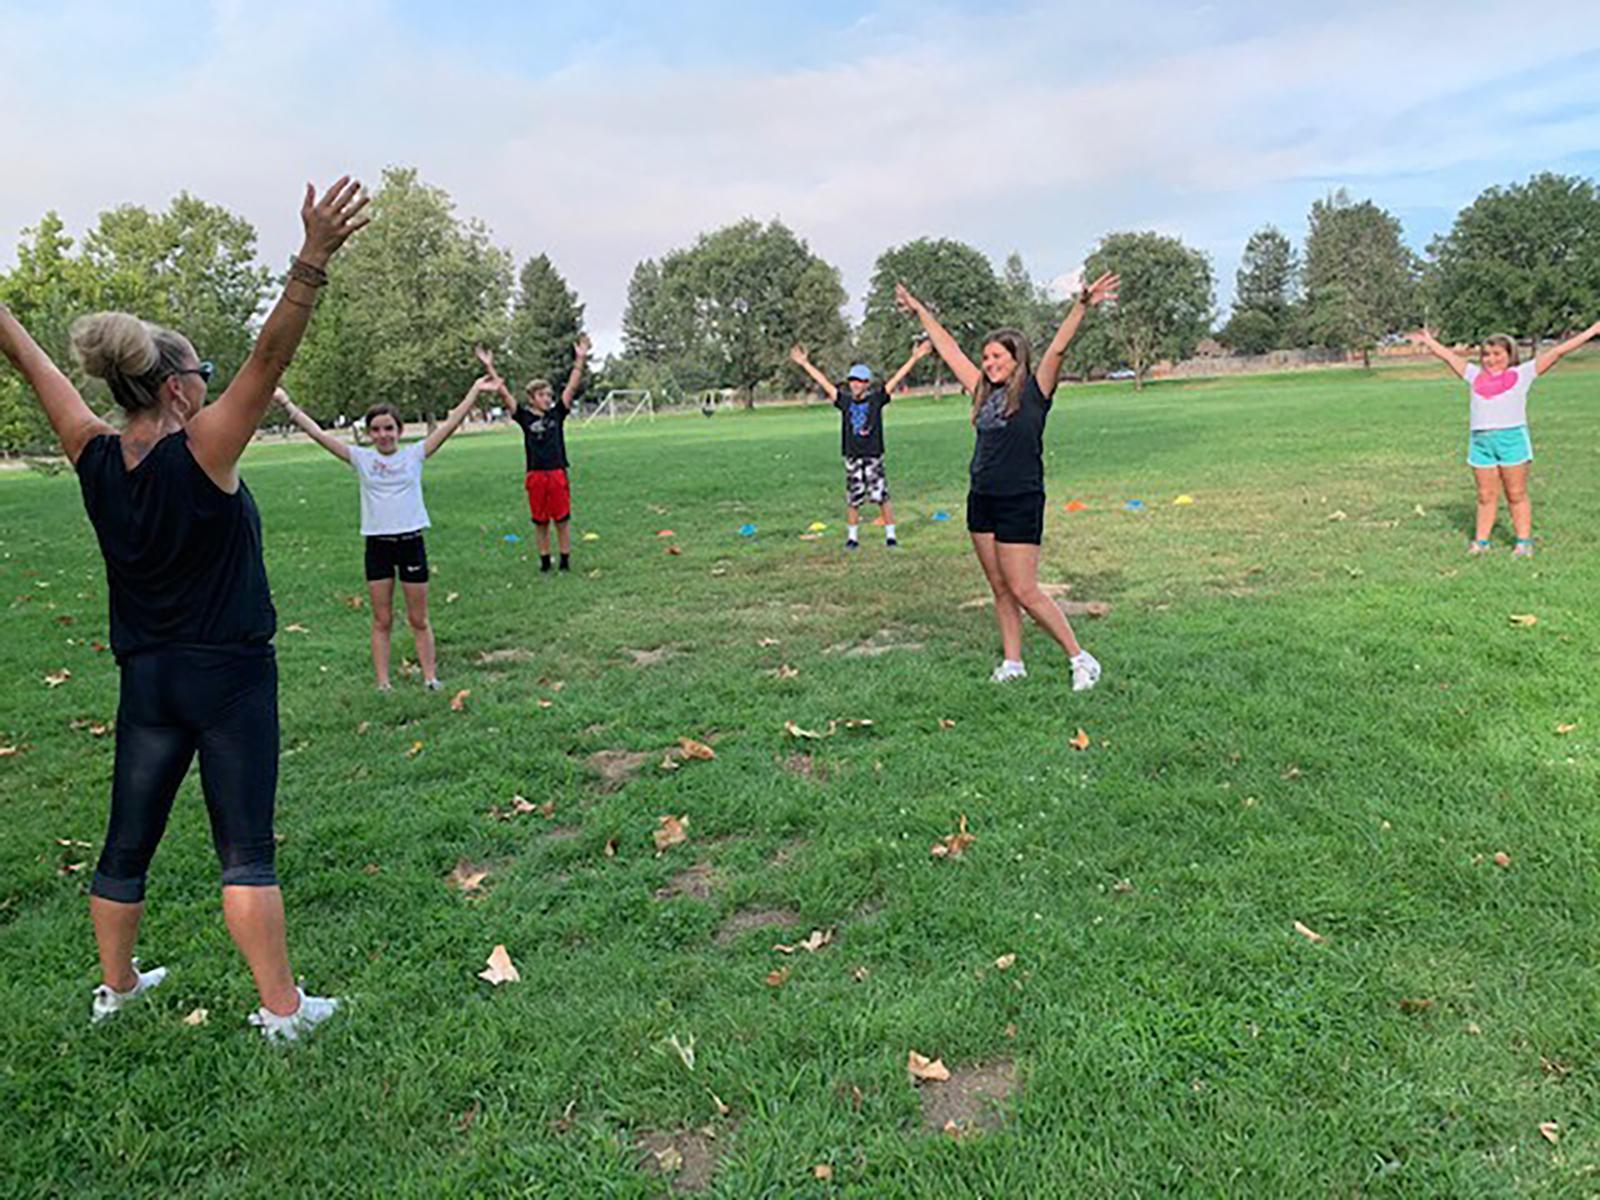 Fitness trainer Myriah Volk of Sebastopol, California, leads a socially distanced gym class through her PE Express 101 business. (Jenny Pellini via CNN)